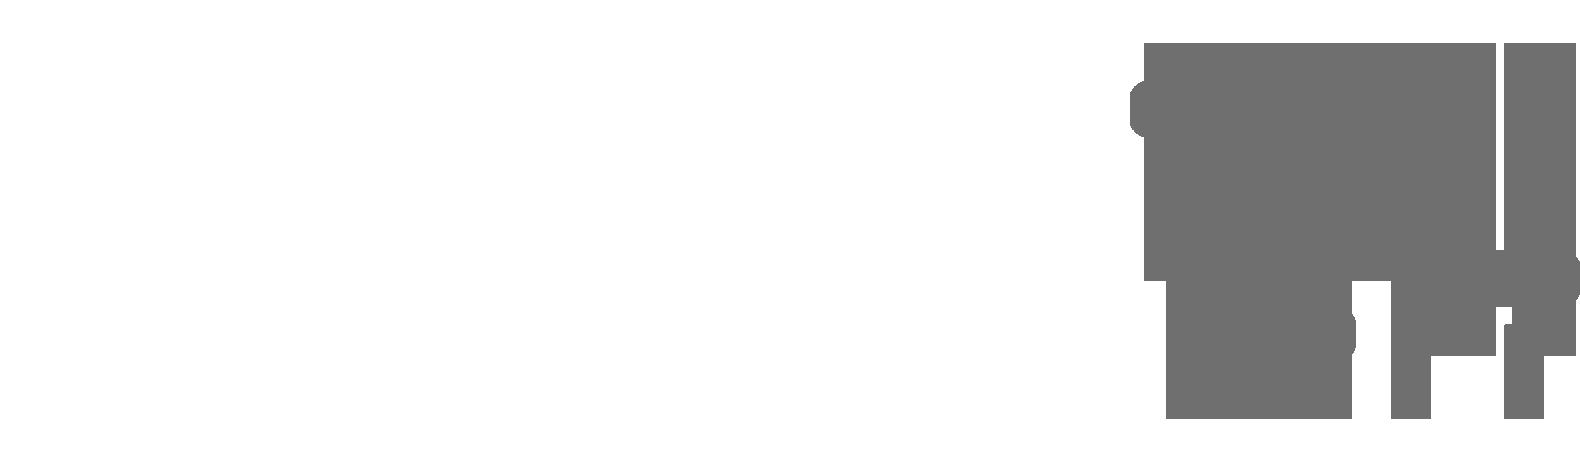 ADSR Network